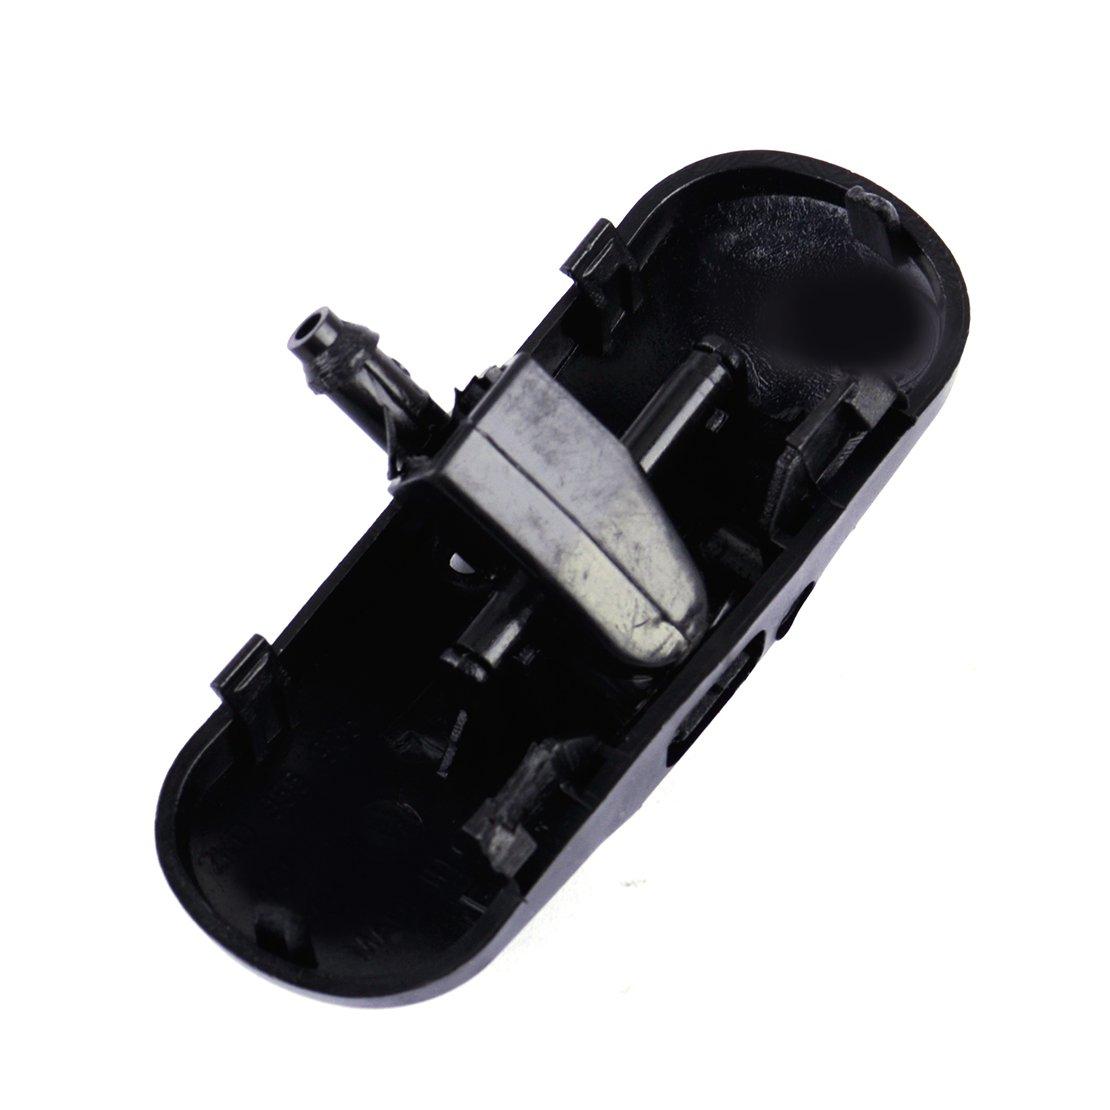 MD 60394 MD99960 HT ImEx Tastatur Farbe: Schwarz MD 99960 MD98557 MD60394 MD99310 Deutsches Tastaturlayout kompatibel f/ür Medion Akoya MD98743 MD 98557 MD98738 MD98471